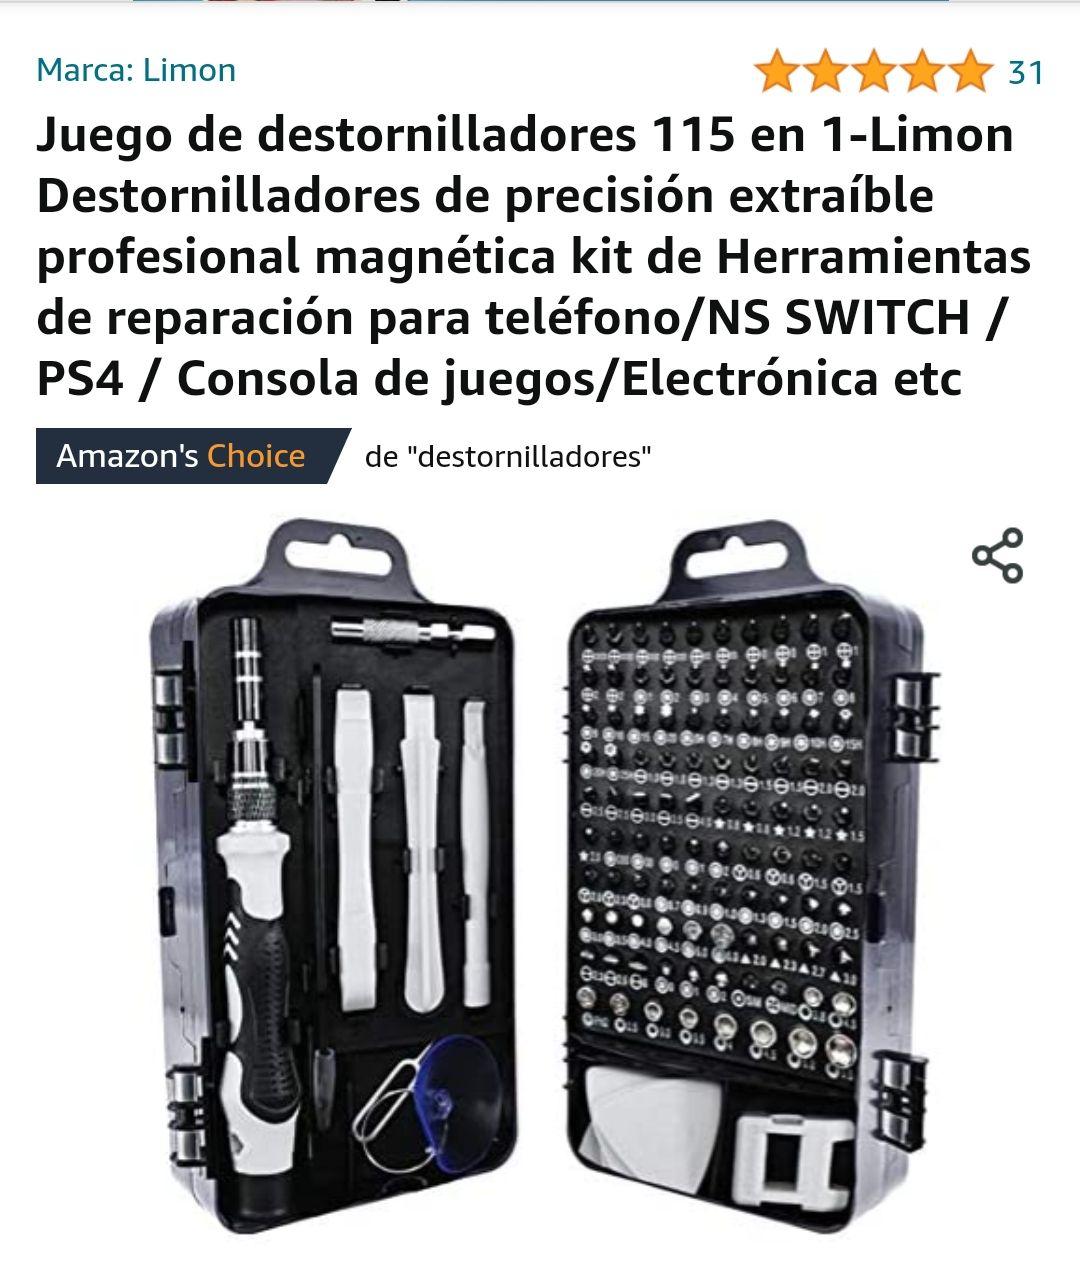 Amazon Juego de destornilladores 115 en 1-Limon Destornilladores de precisión extraíble